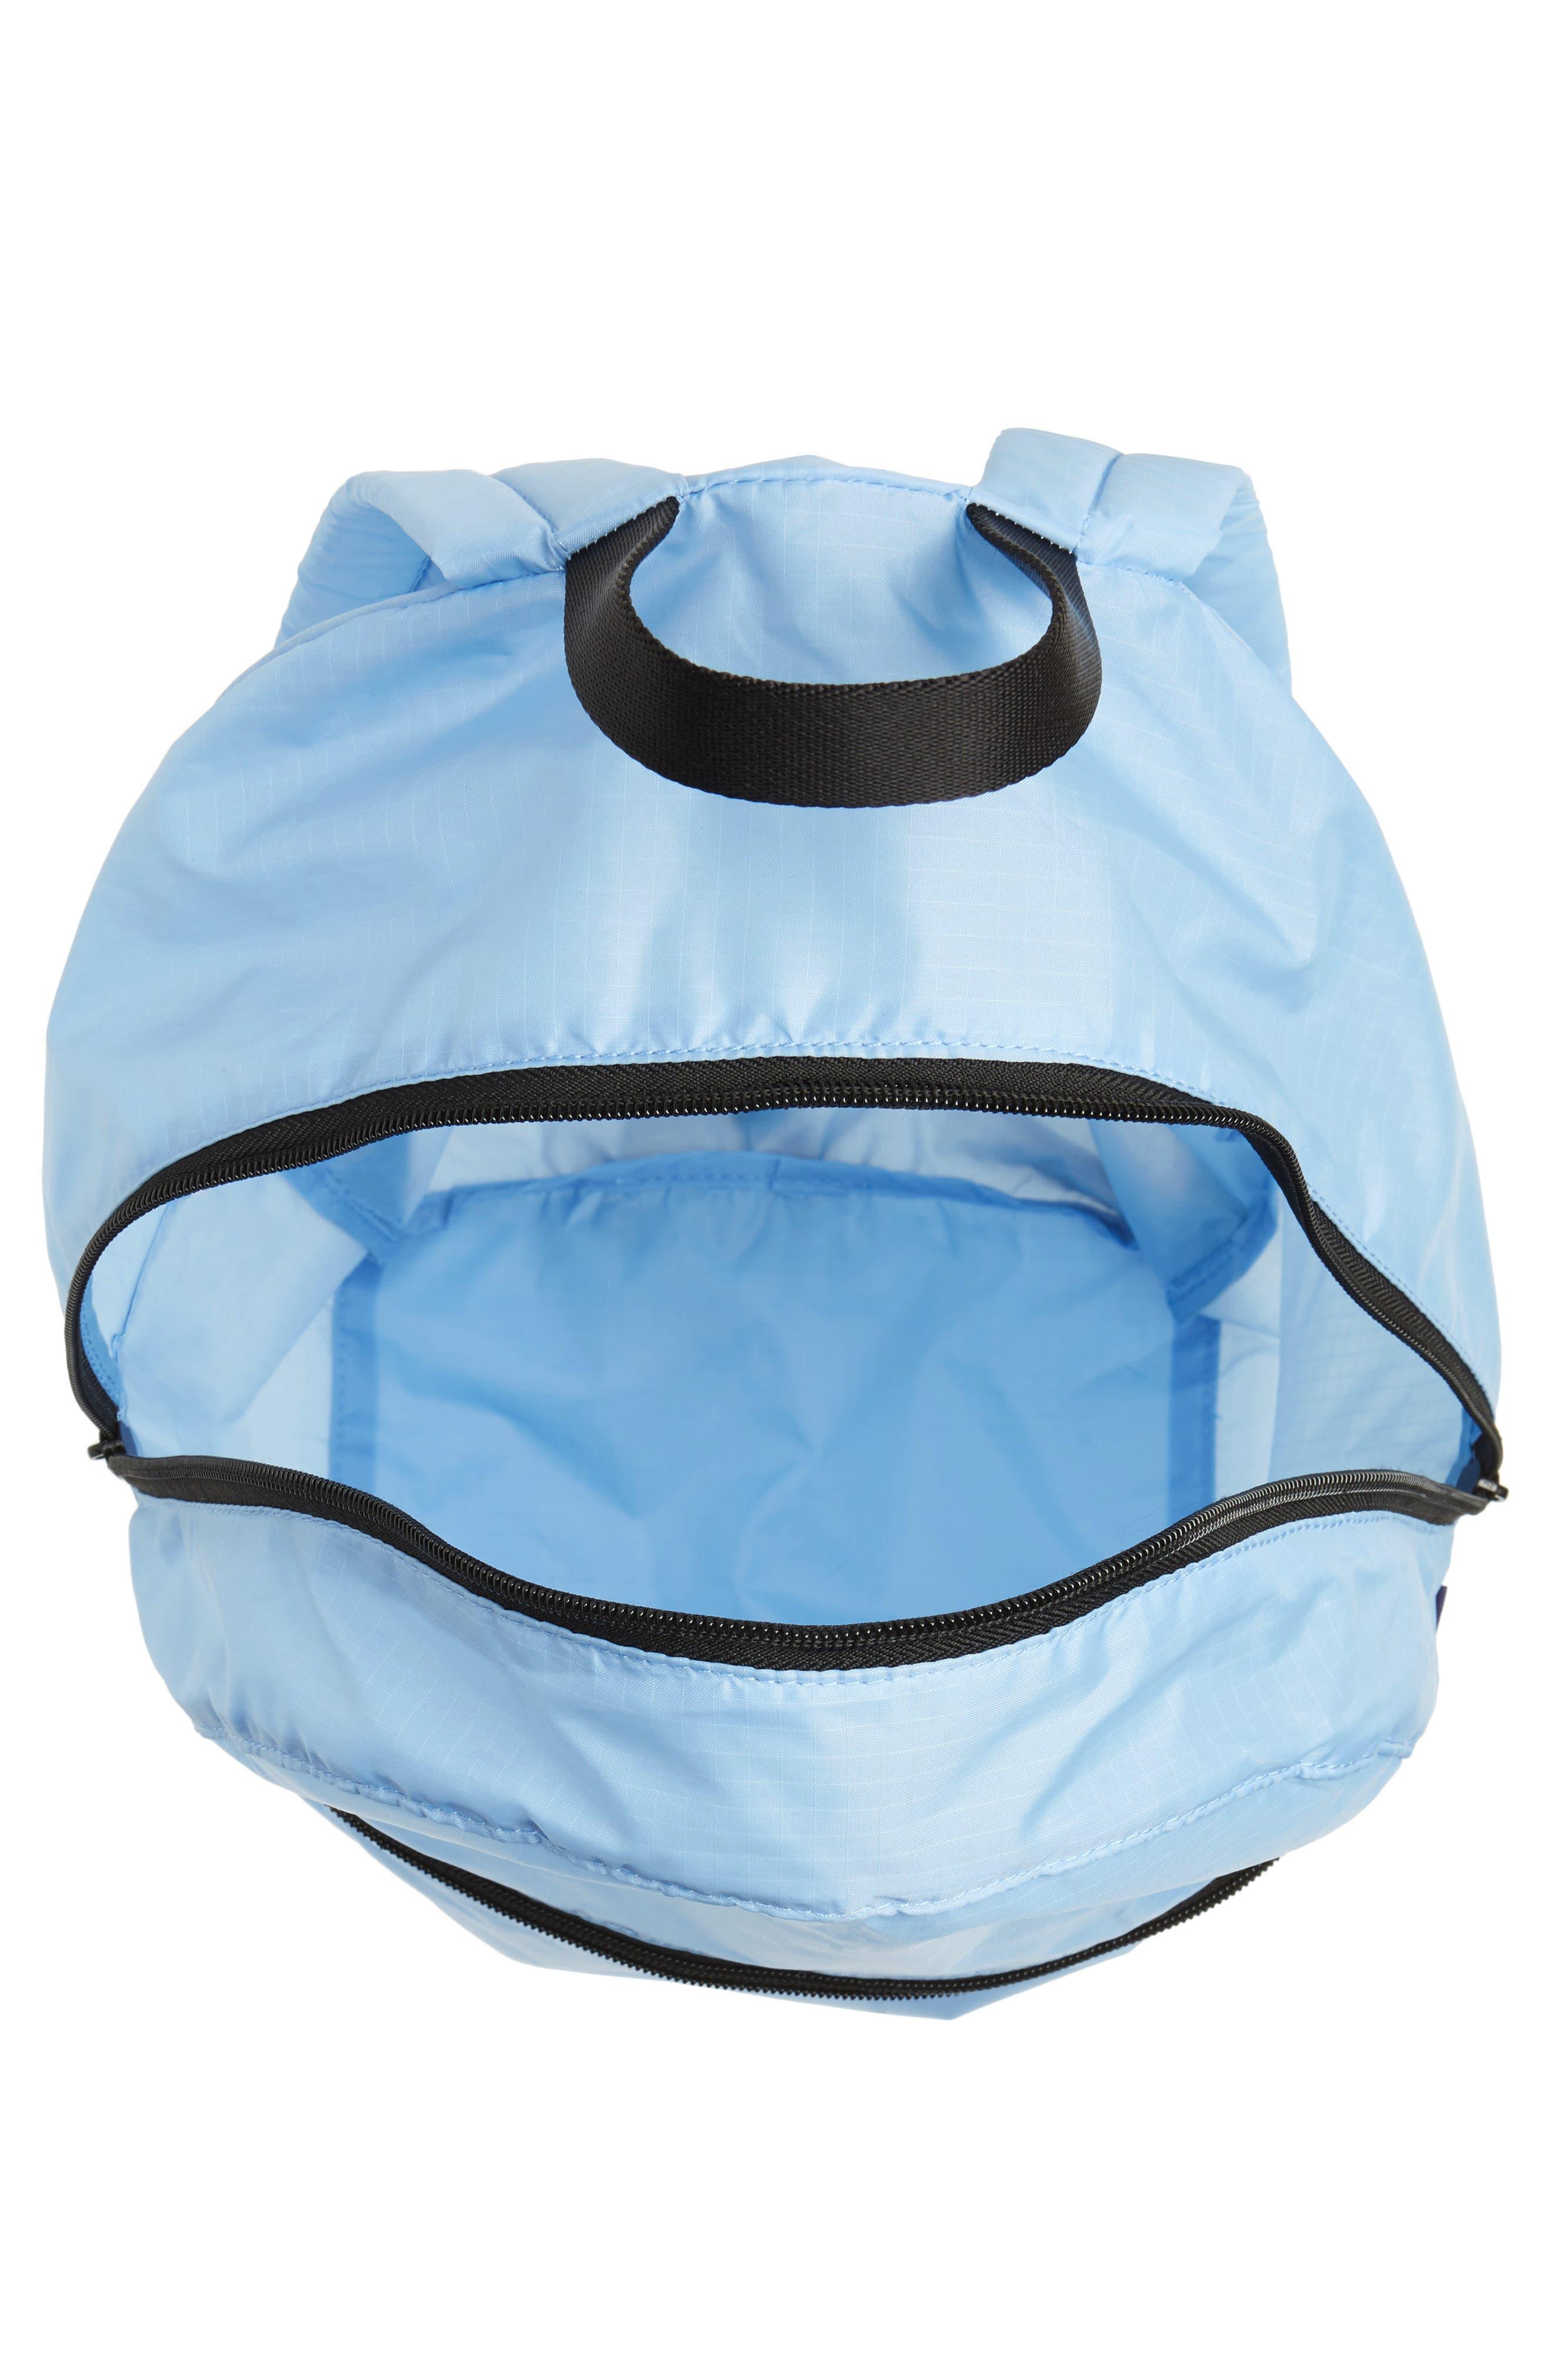 Ripstop Nylon Backpack,                             Alternate thumbnail 15, color,